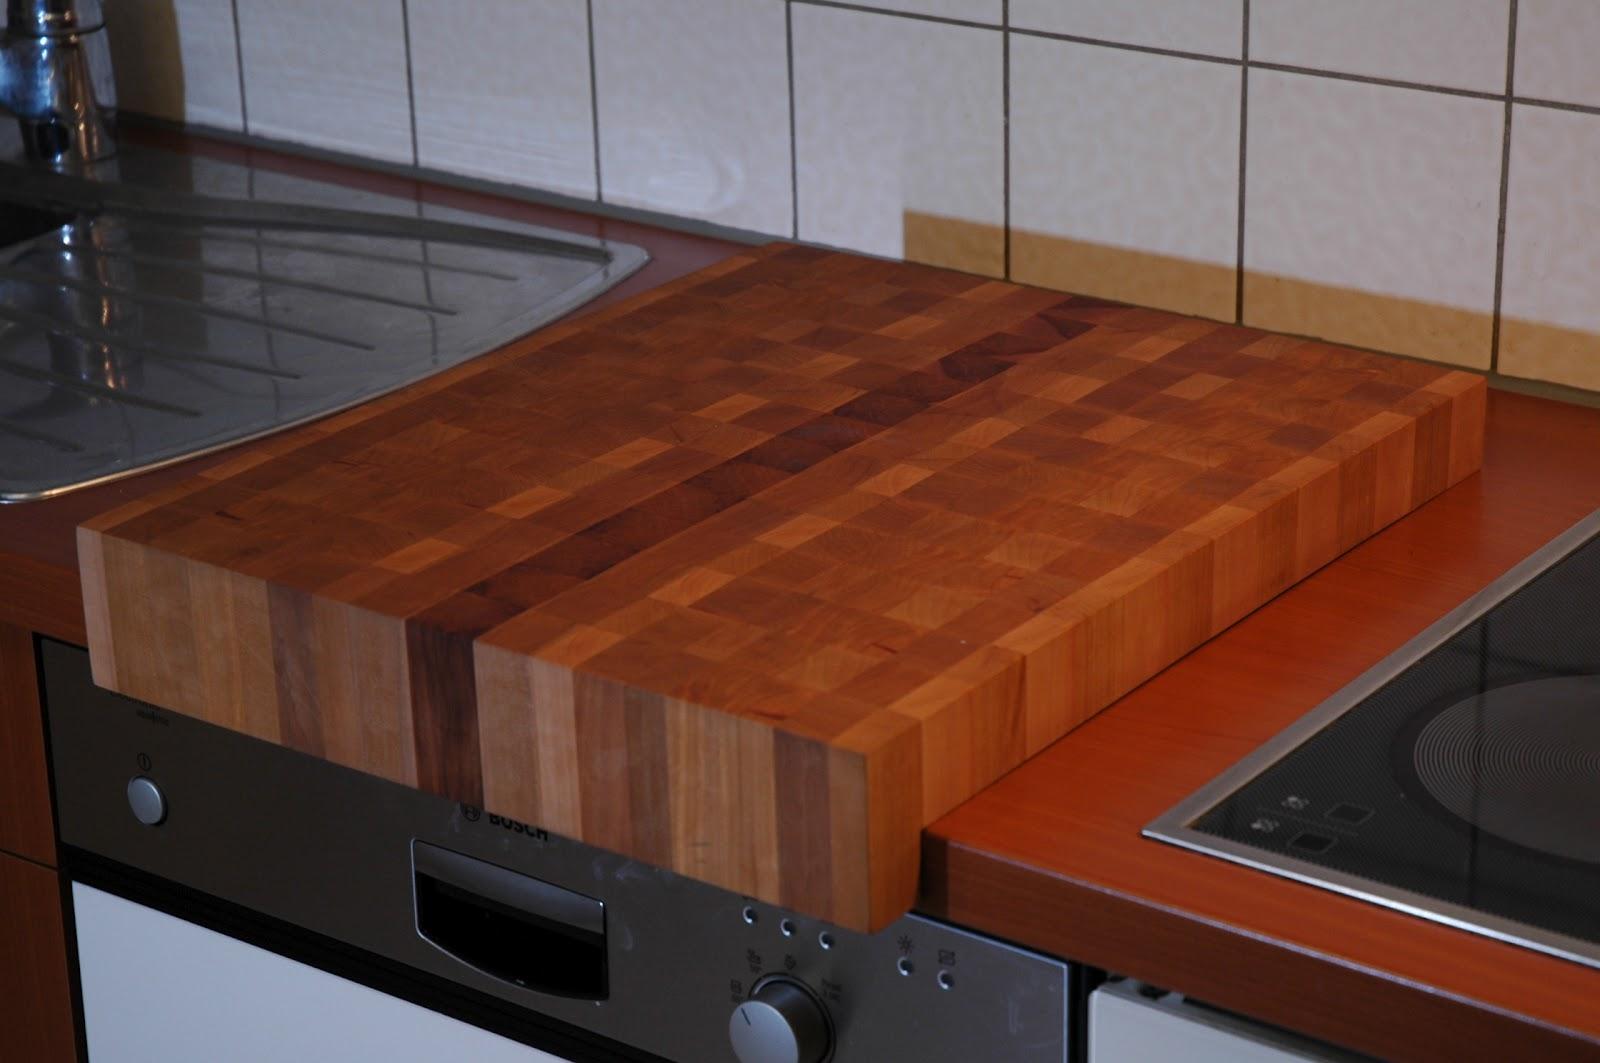 holzprojekte gro es schneidebrett. Black Bedroom Furniture Sets. Home Design Ideas